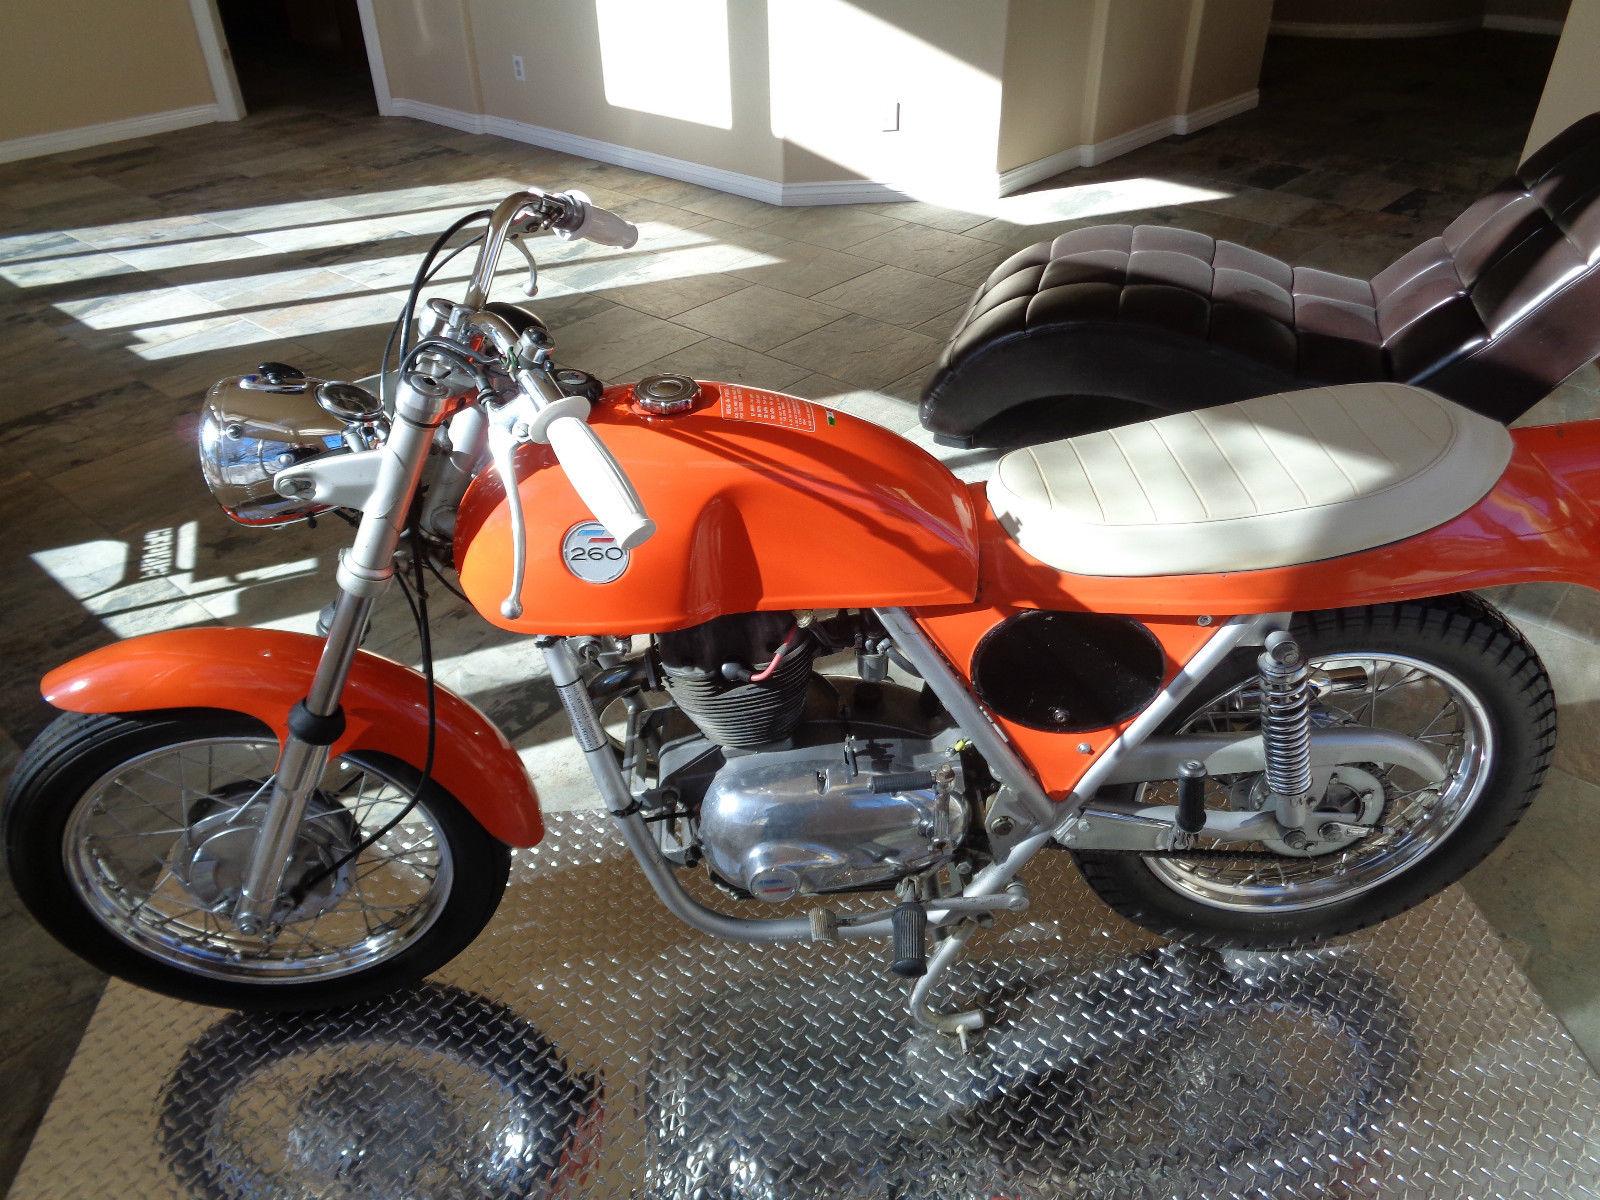 Name:  1968-montgomery-ward-riverside-mojave-260-benelli-4.JPG Views: 1760 Size:  430.2 KB